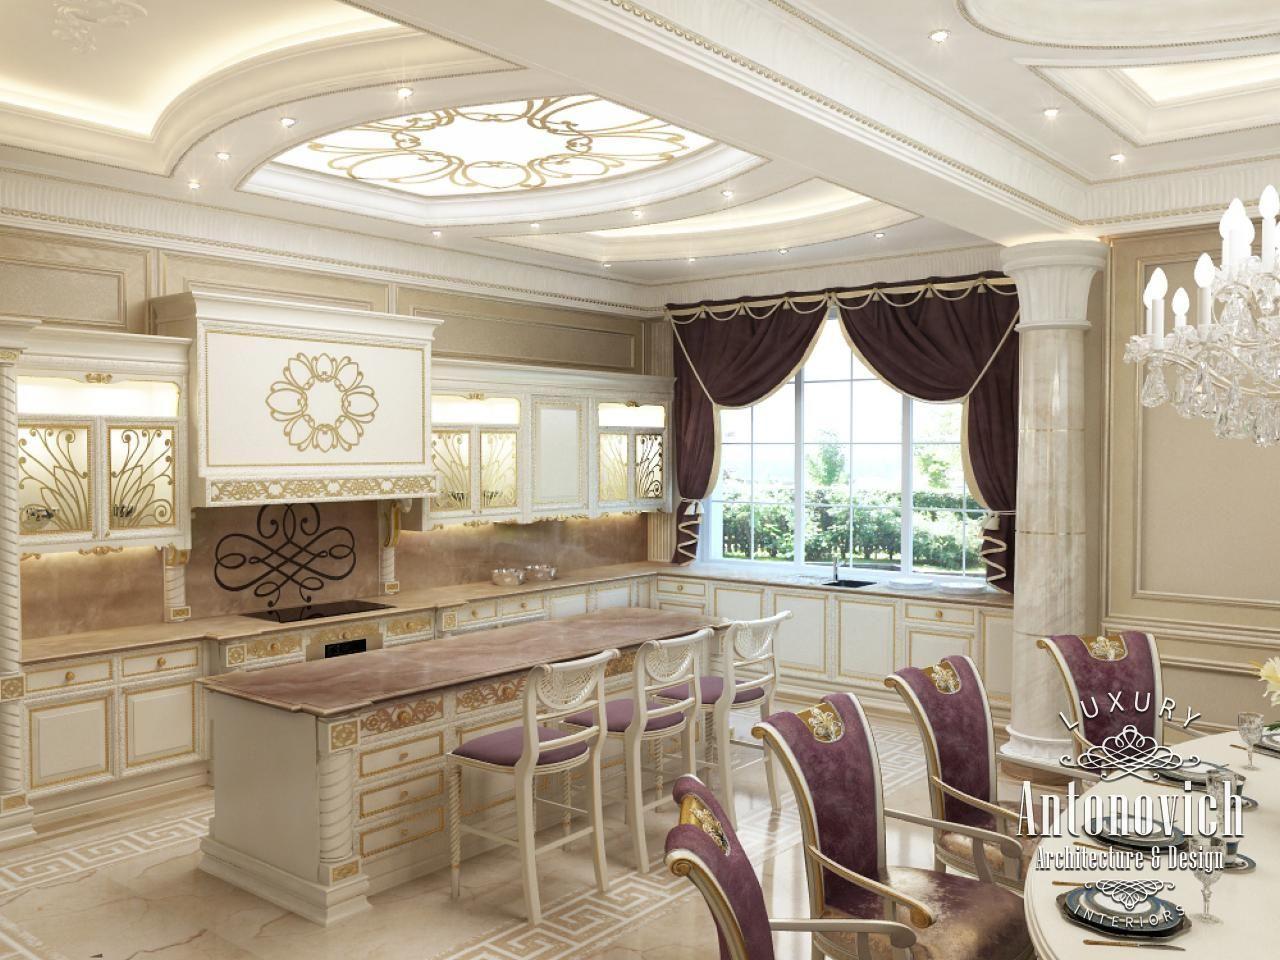 Kitchen Design in Dubai, Kitchen Interior in Neoclassical, Photo 1 | Chandelier in living room